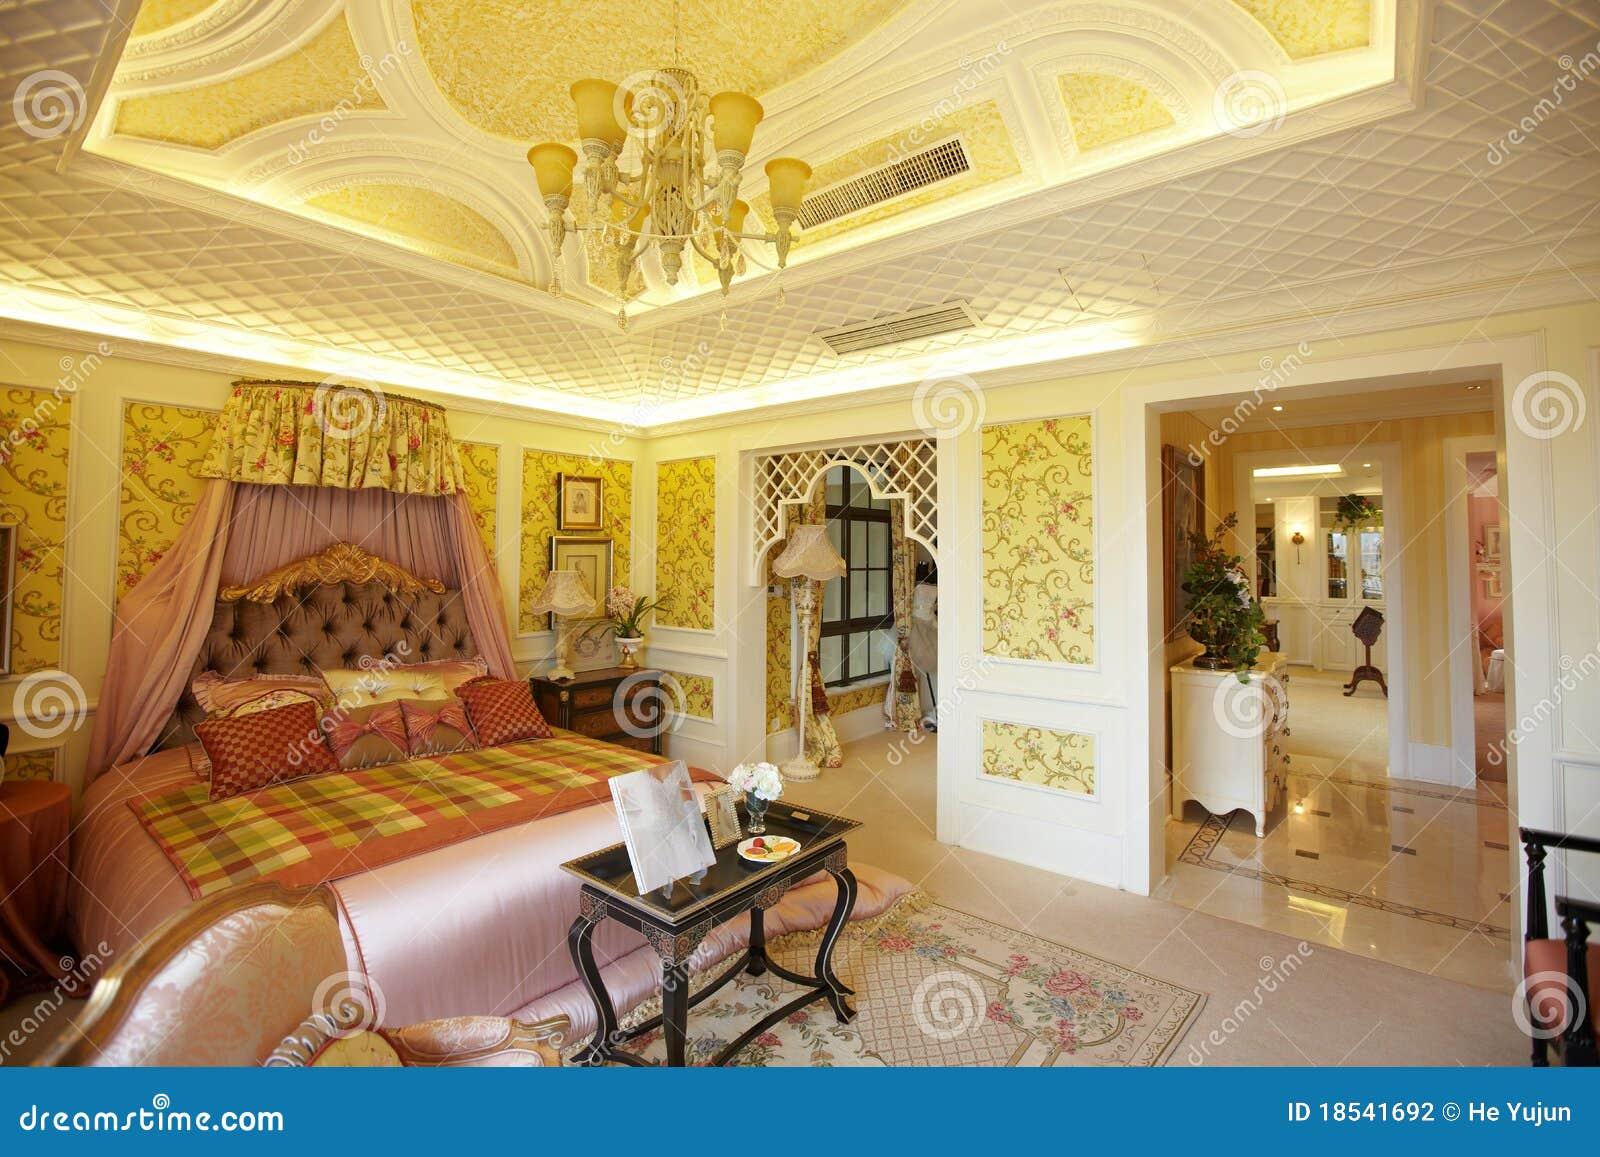 Dormitorio casero de lujo moderno